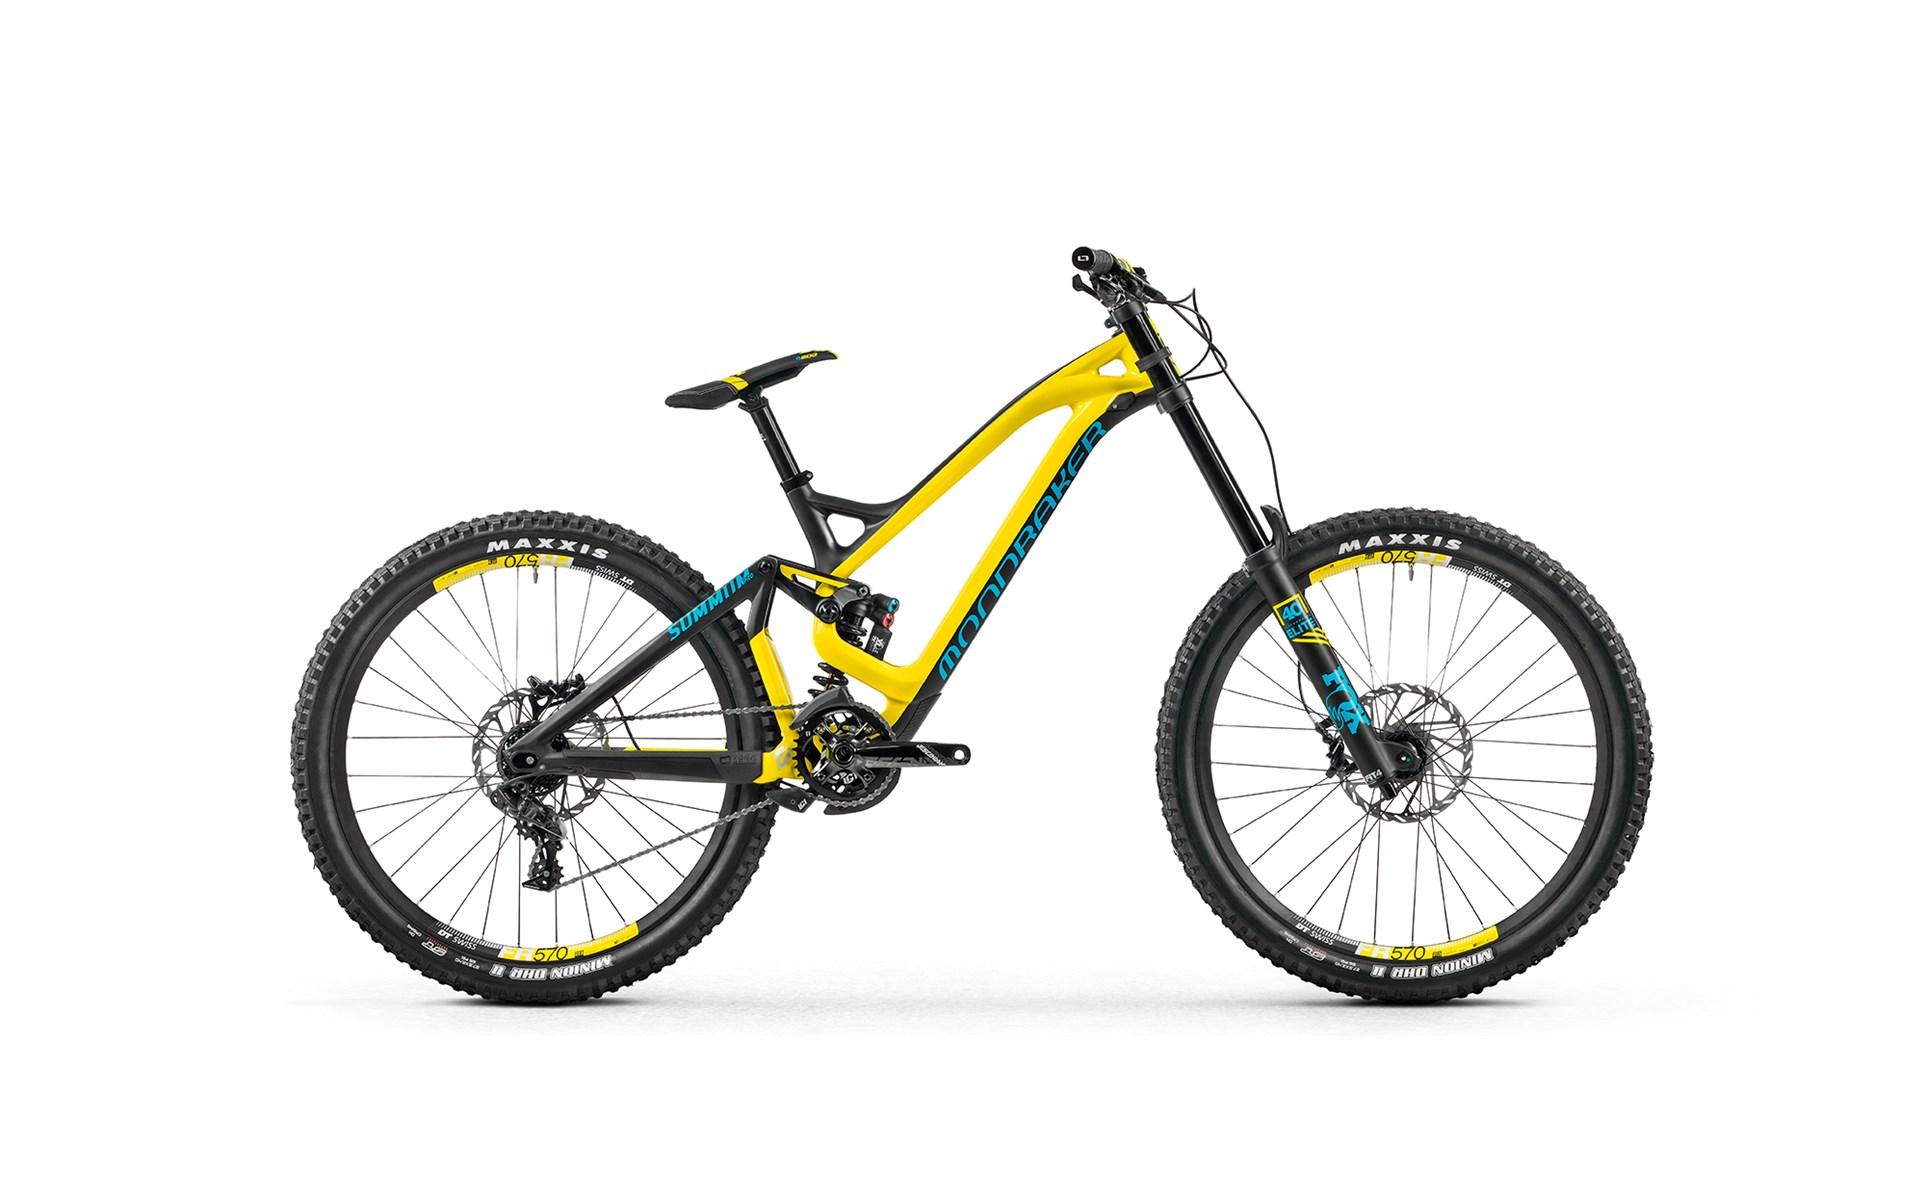 Mondraker Summum Carbon Pro 27.5 2017 Downhill Bike £5,499.00